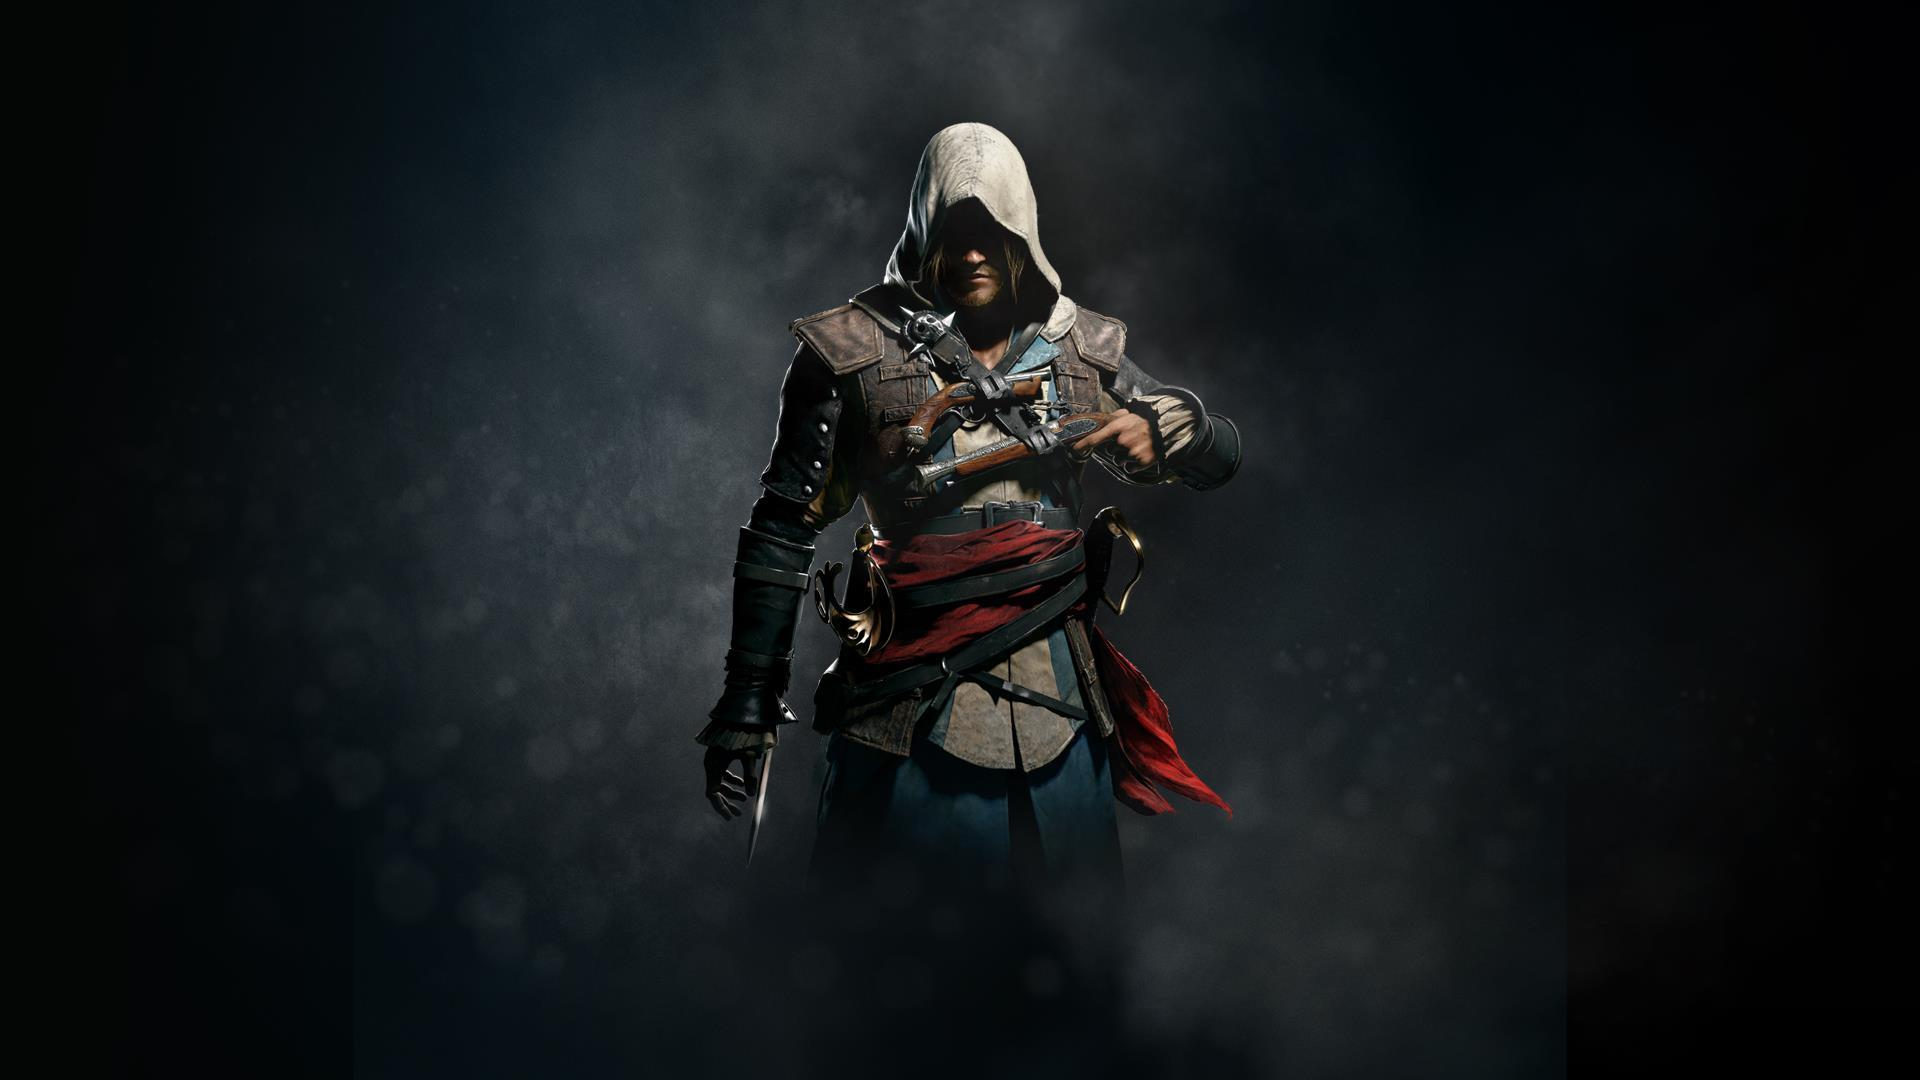 Killer Killer in Assassin's Creed IV: Black Flag (Xbox One)